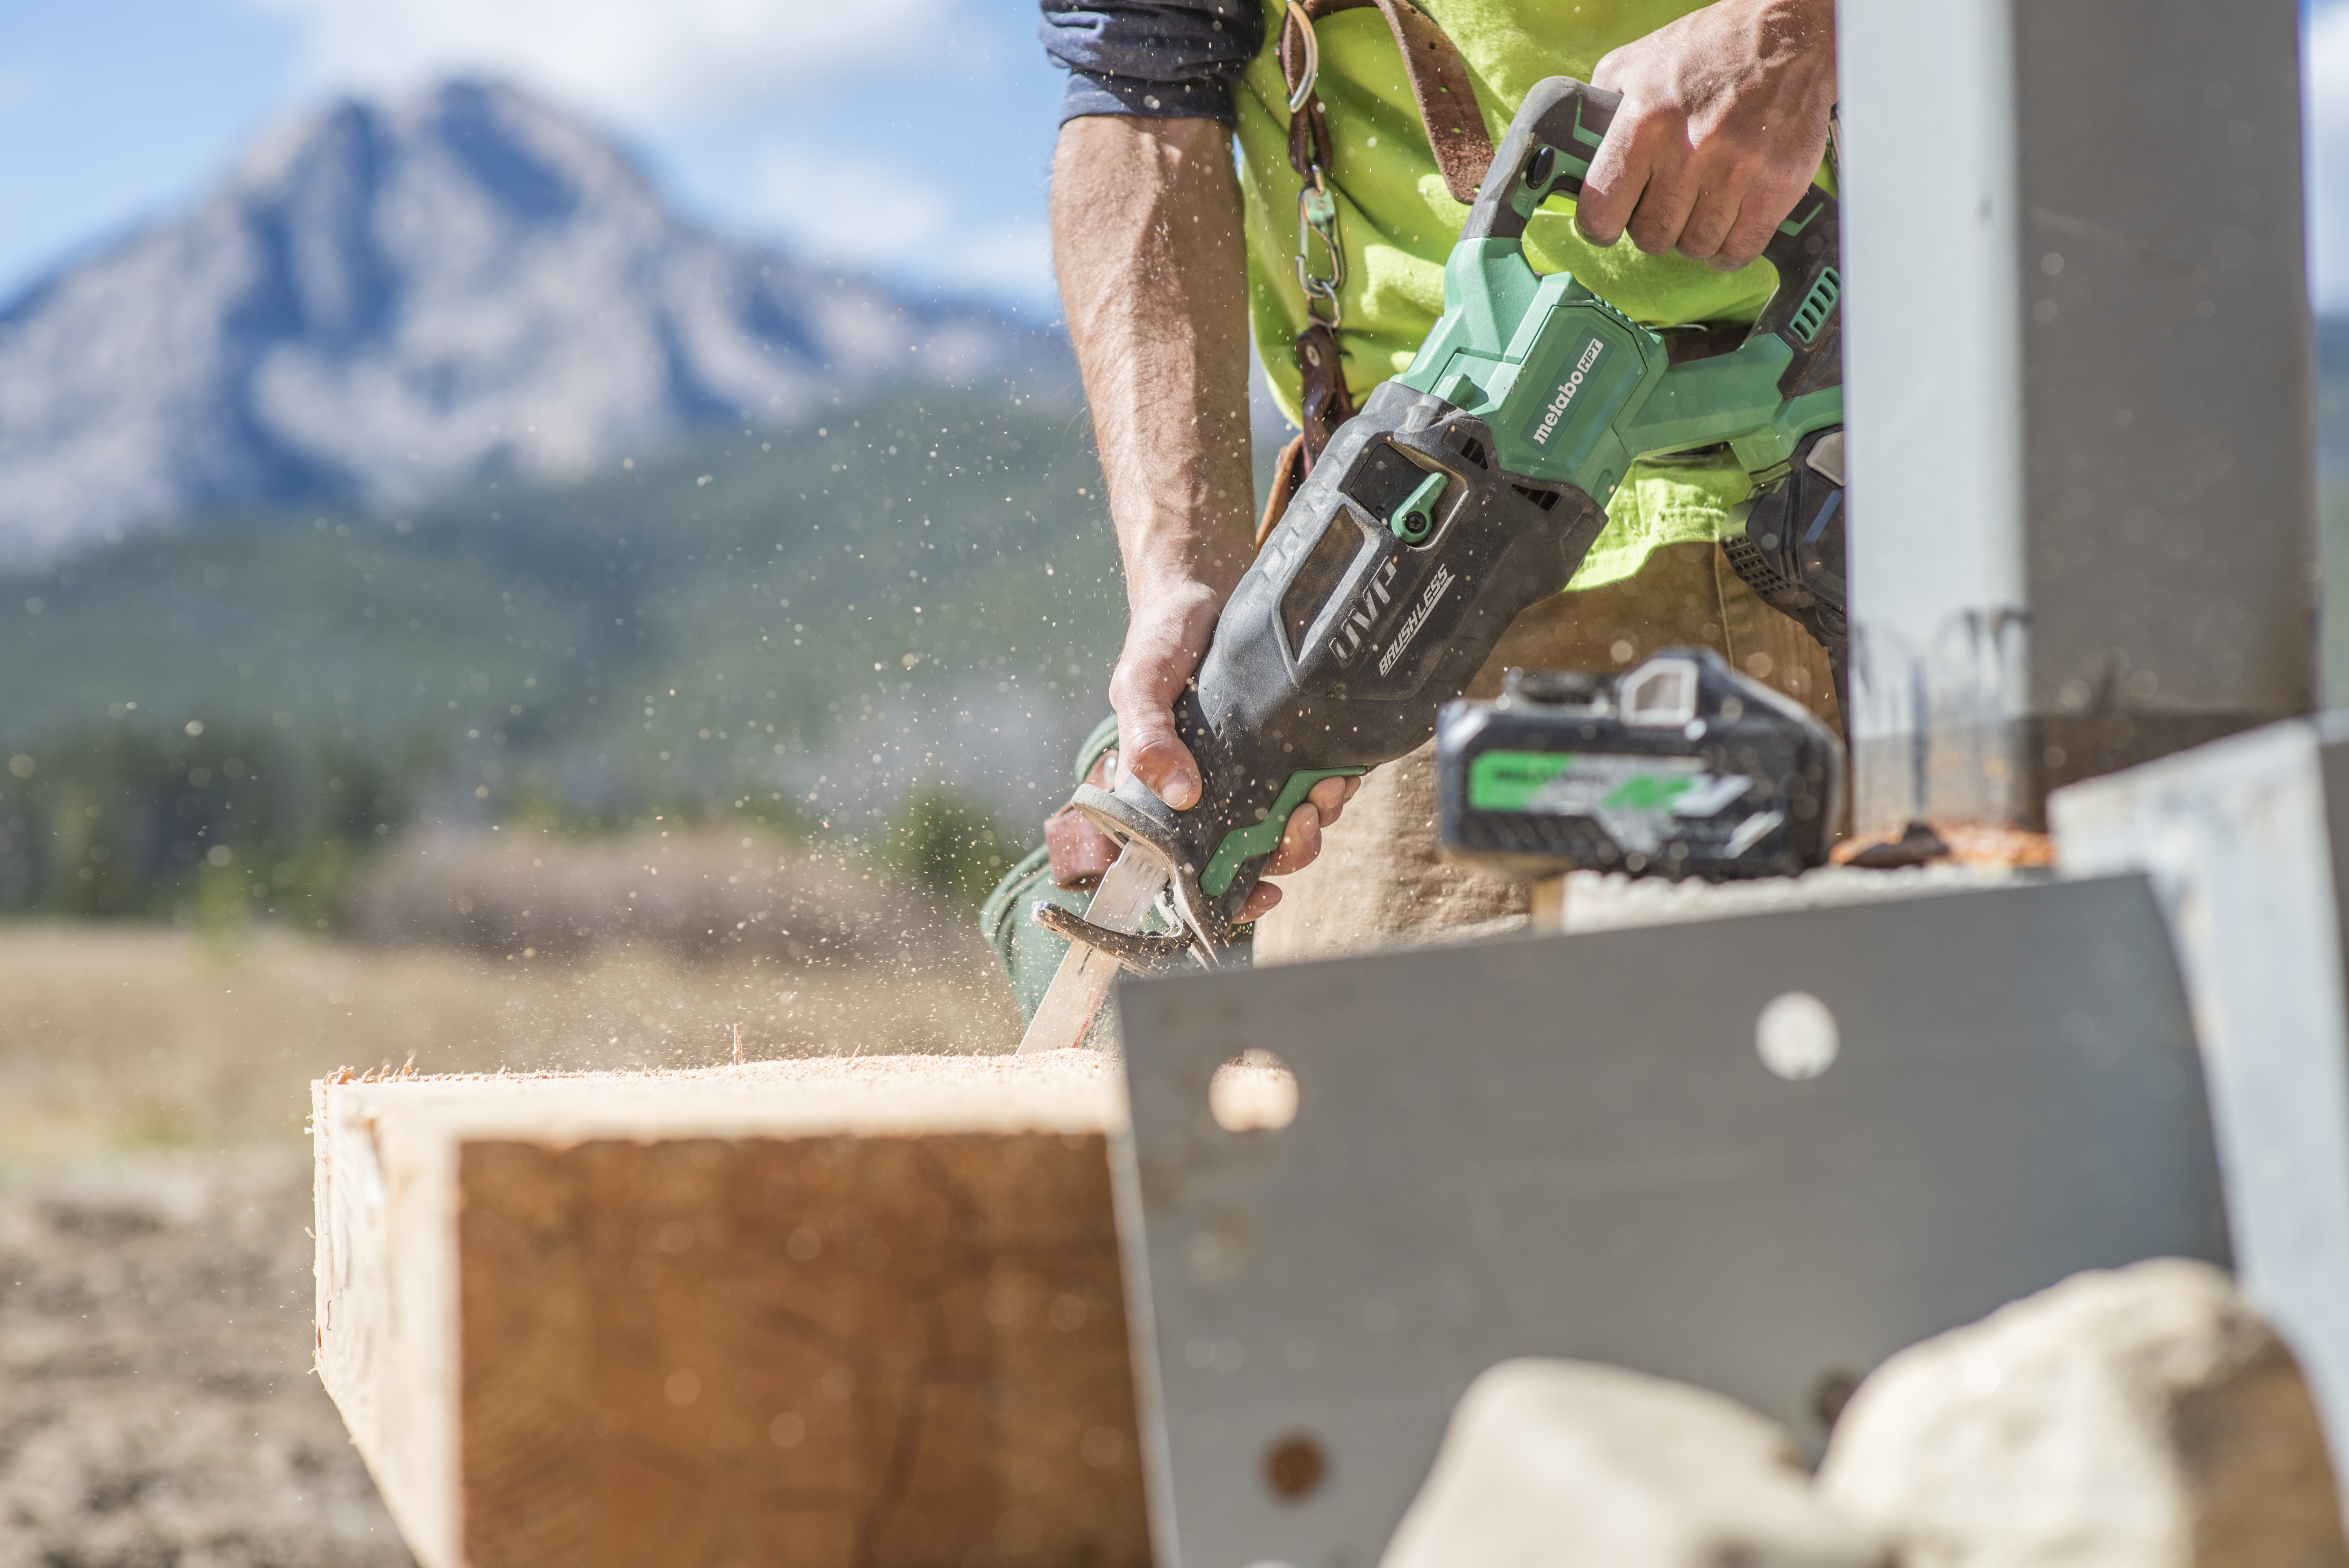 MultiVolt Reciprocating Saw Cutting